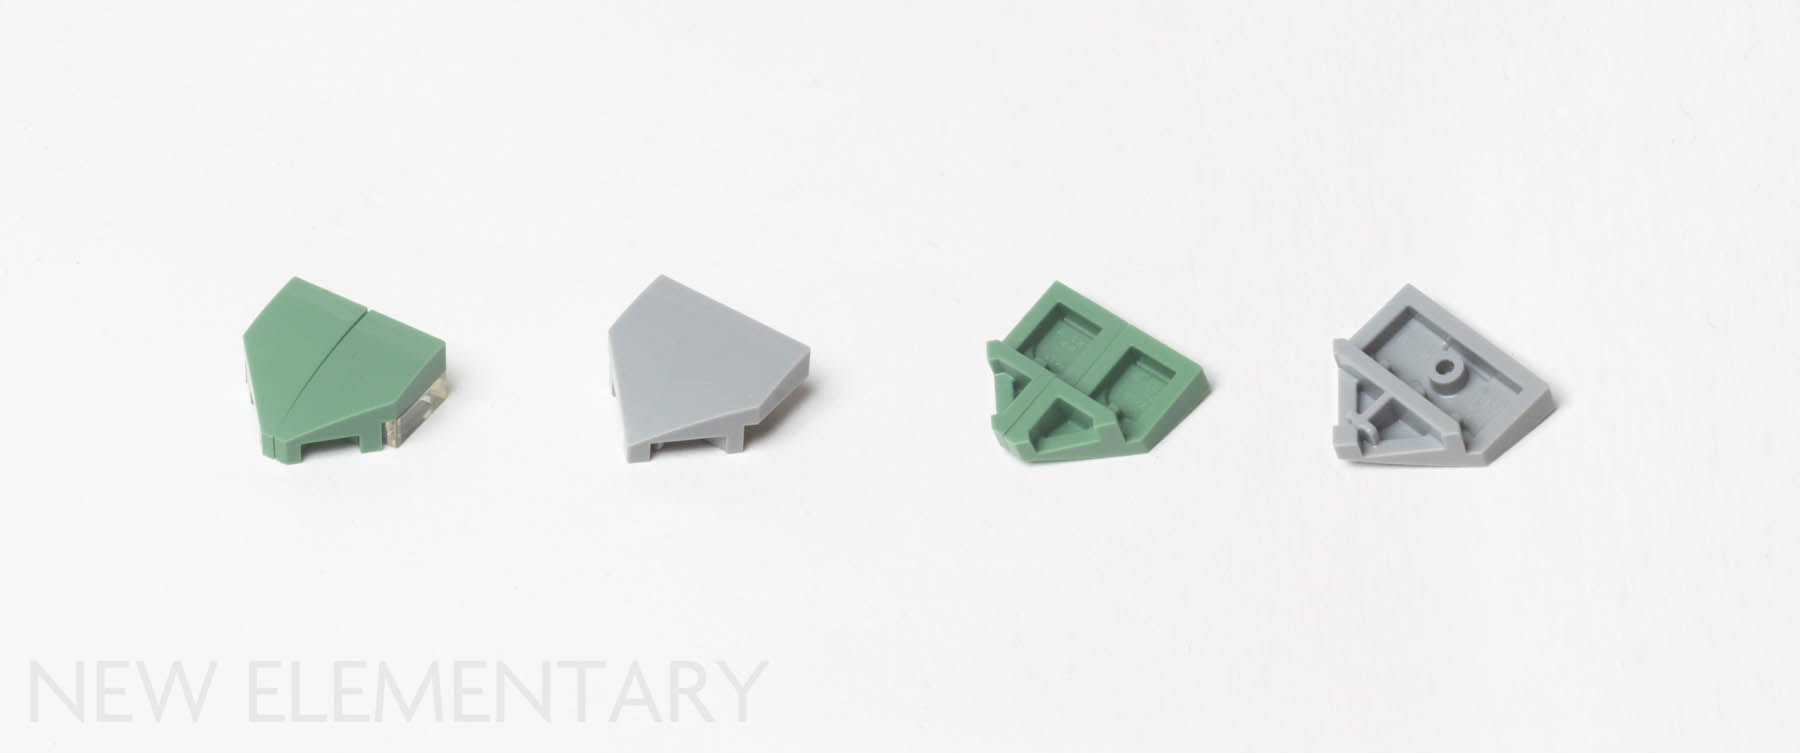 6 2x2 White Inverted Rounded Bottom Bow Bricks ~ New Lego Parts